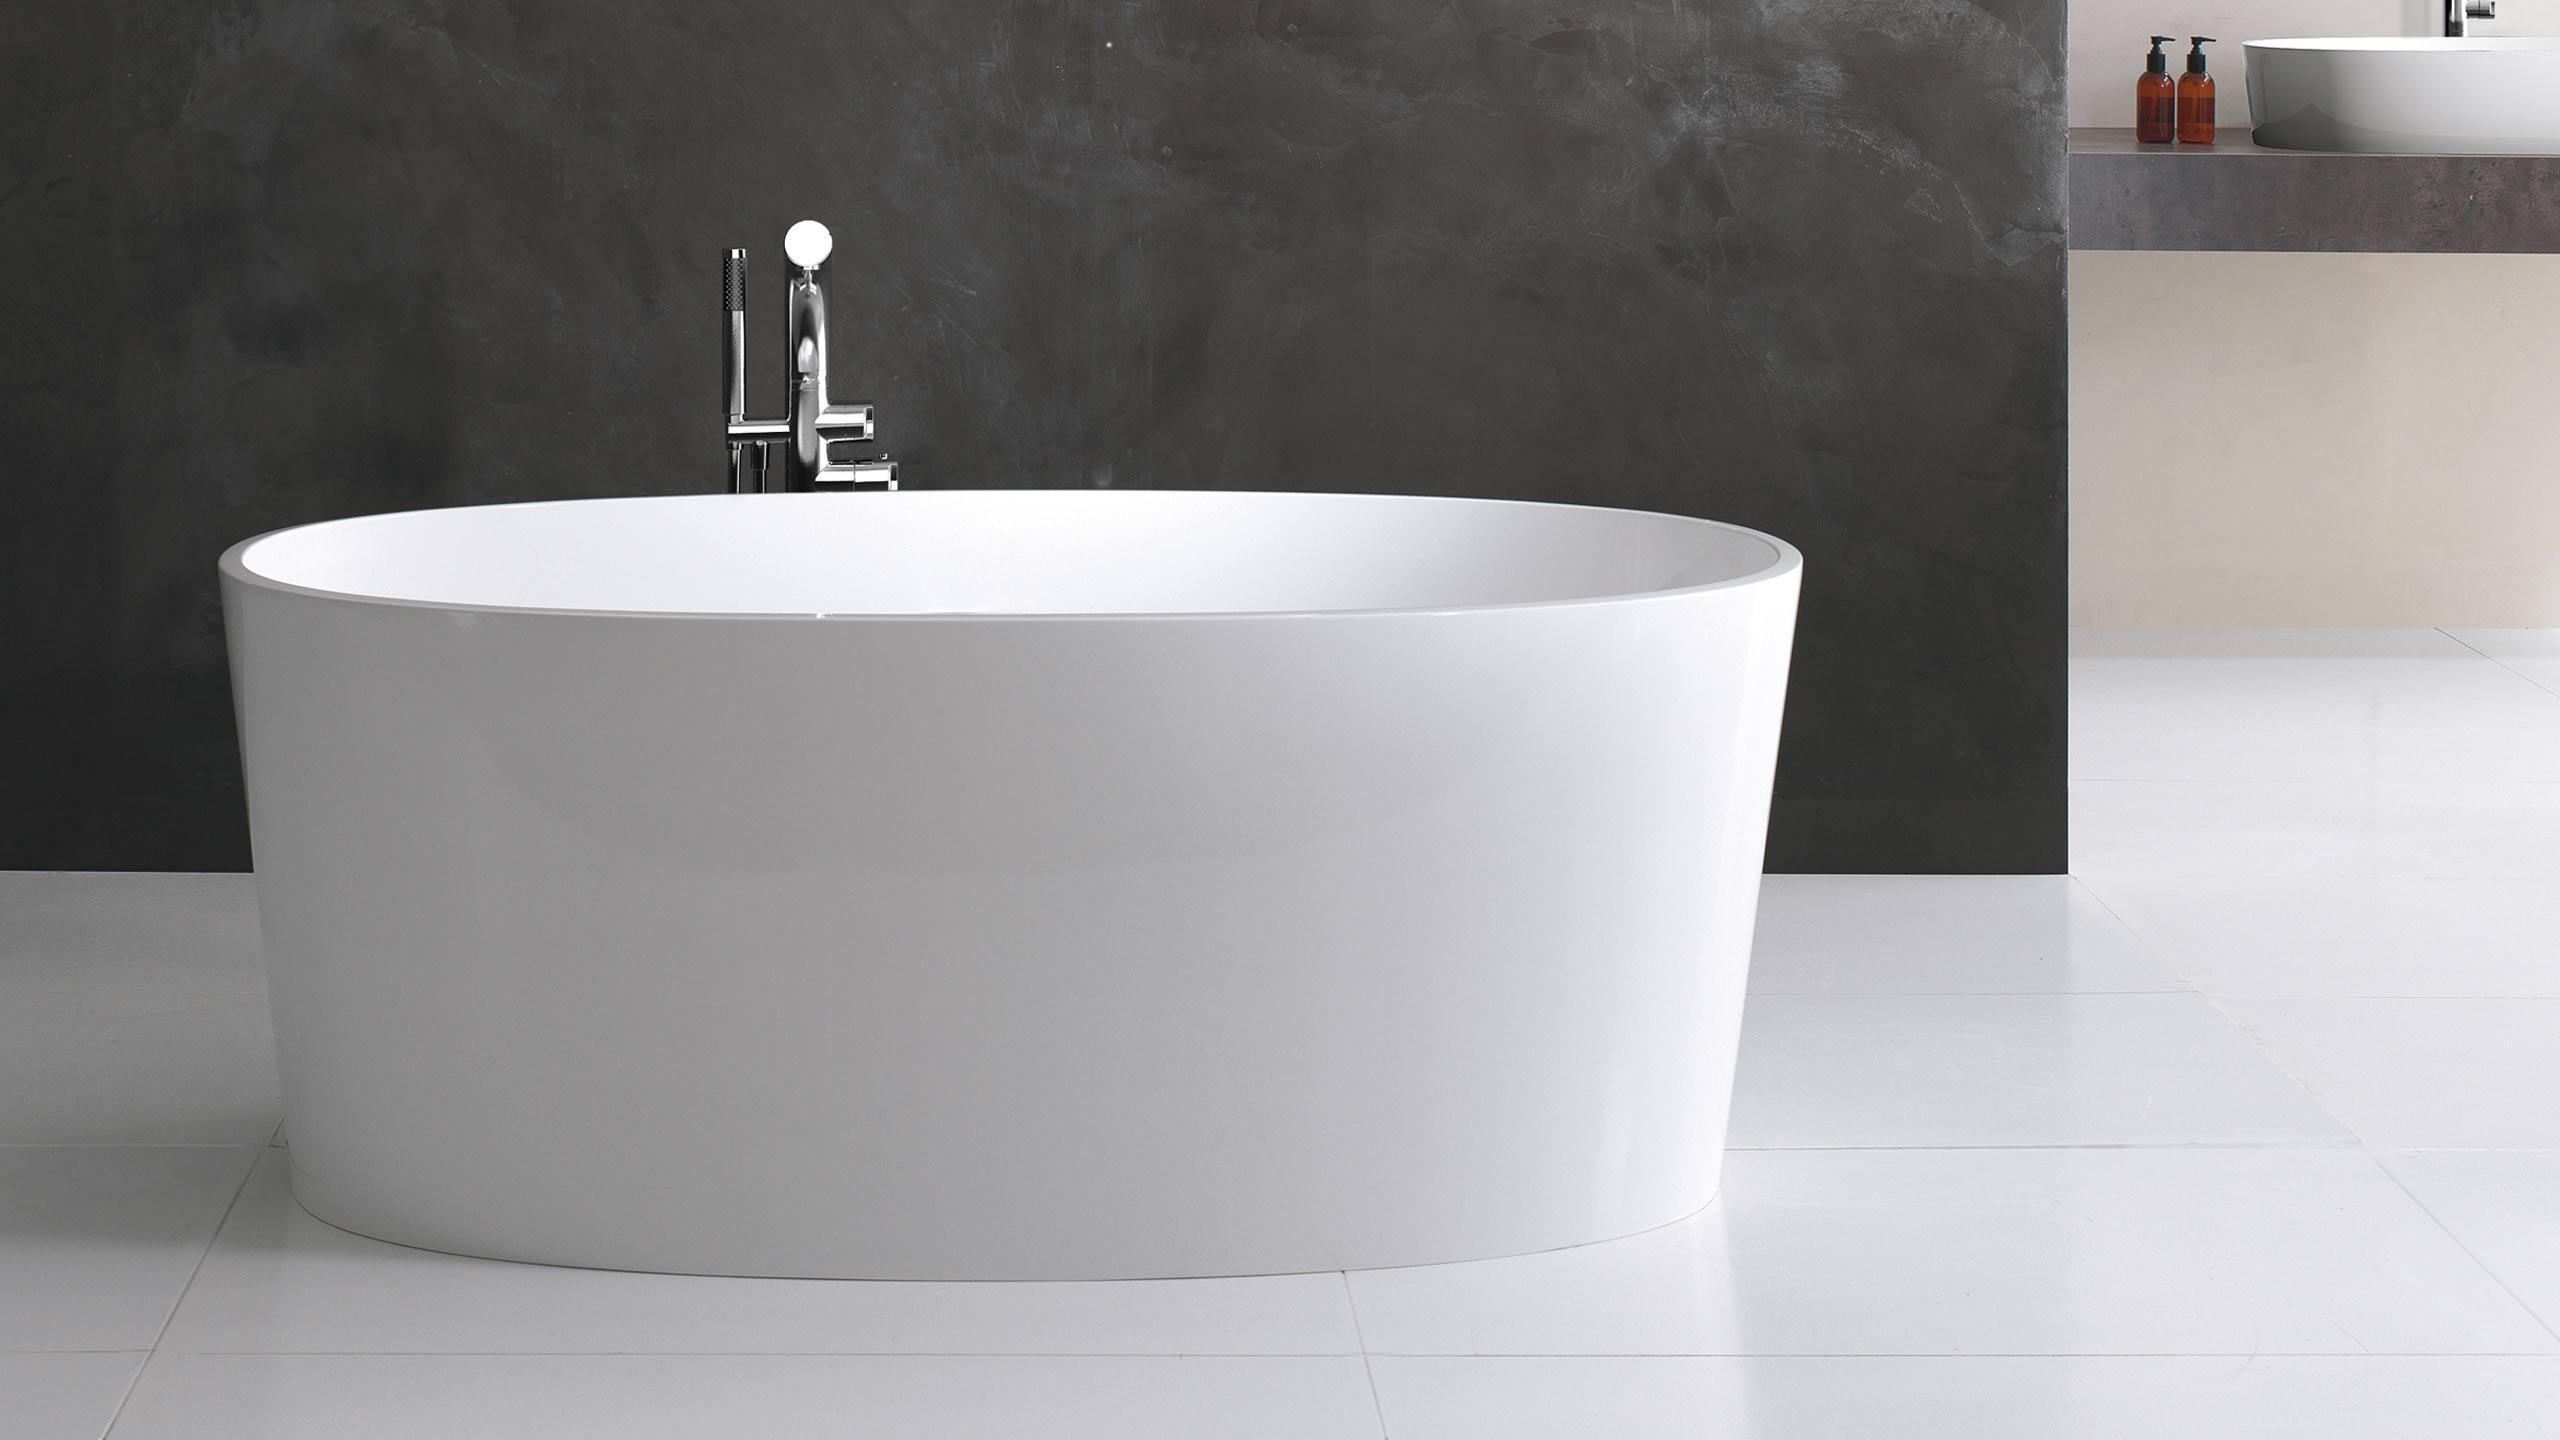 Vasca Da Bagno Amalfi Prezzo : Victoria albert vasche vasche da bagno edilceramiche di maccanò